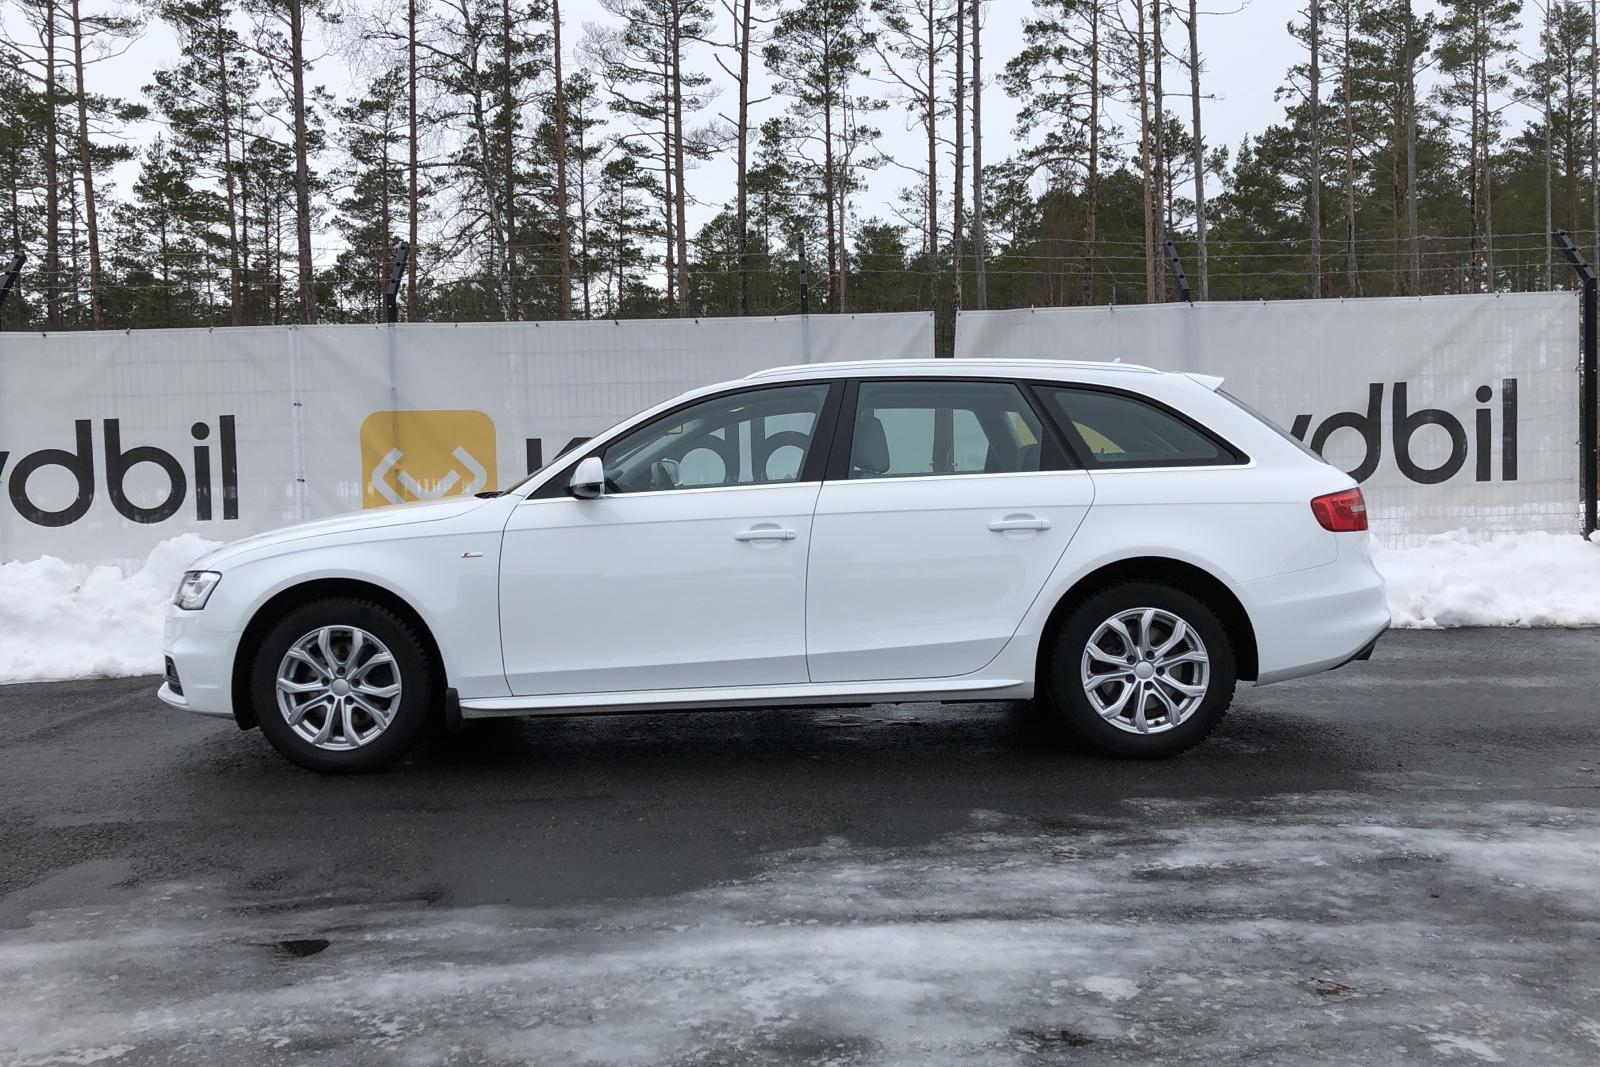 Audi A4 2.0 TDI clean diesel Avant (150hk) - 121 960 km - Automatic - white - 2015